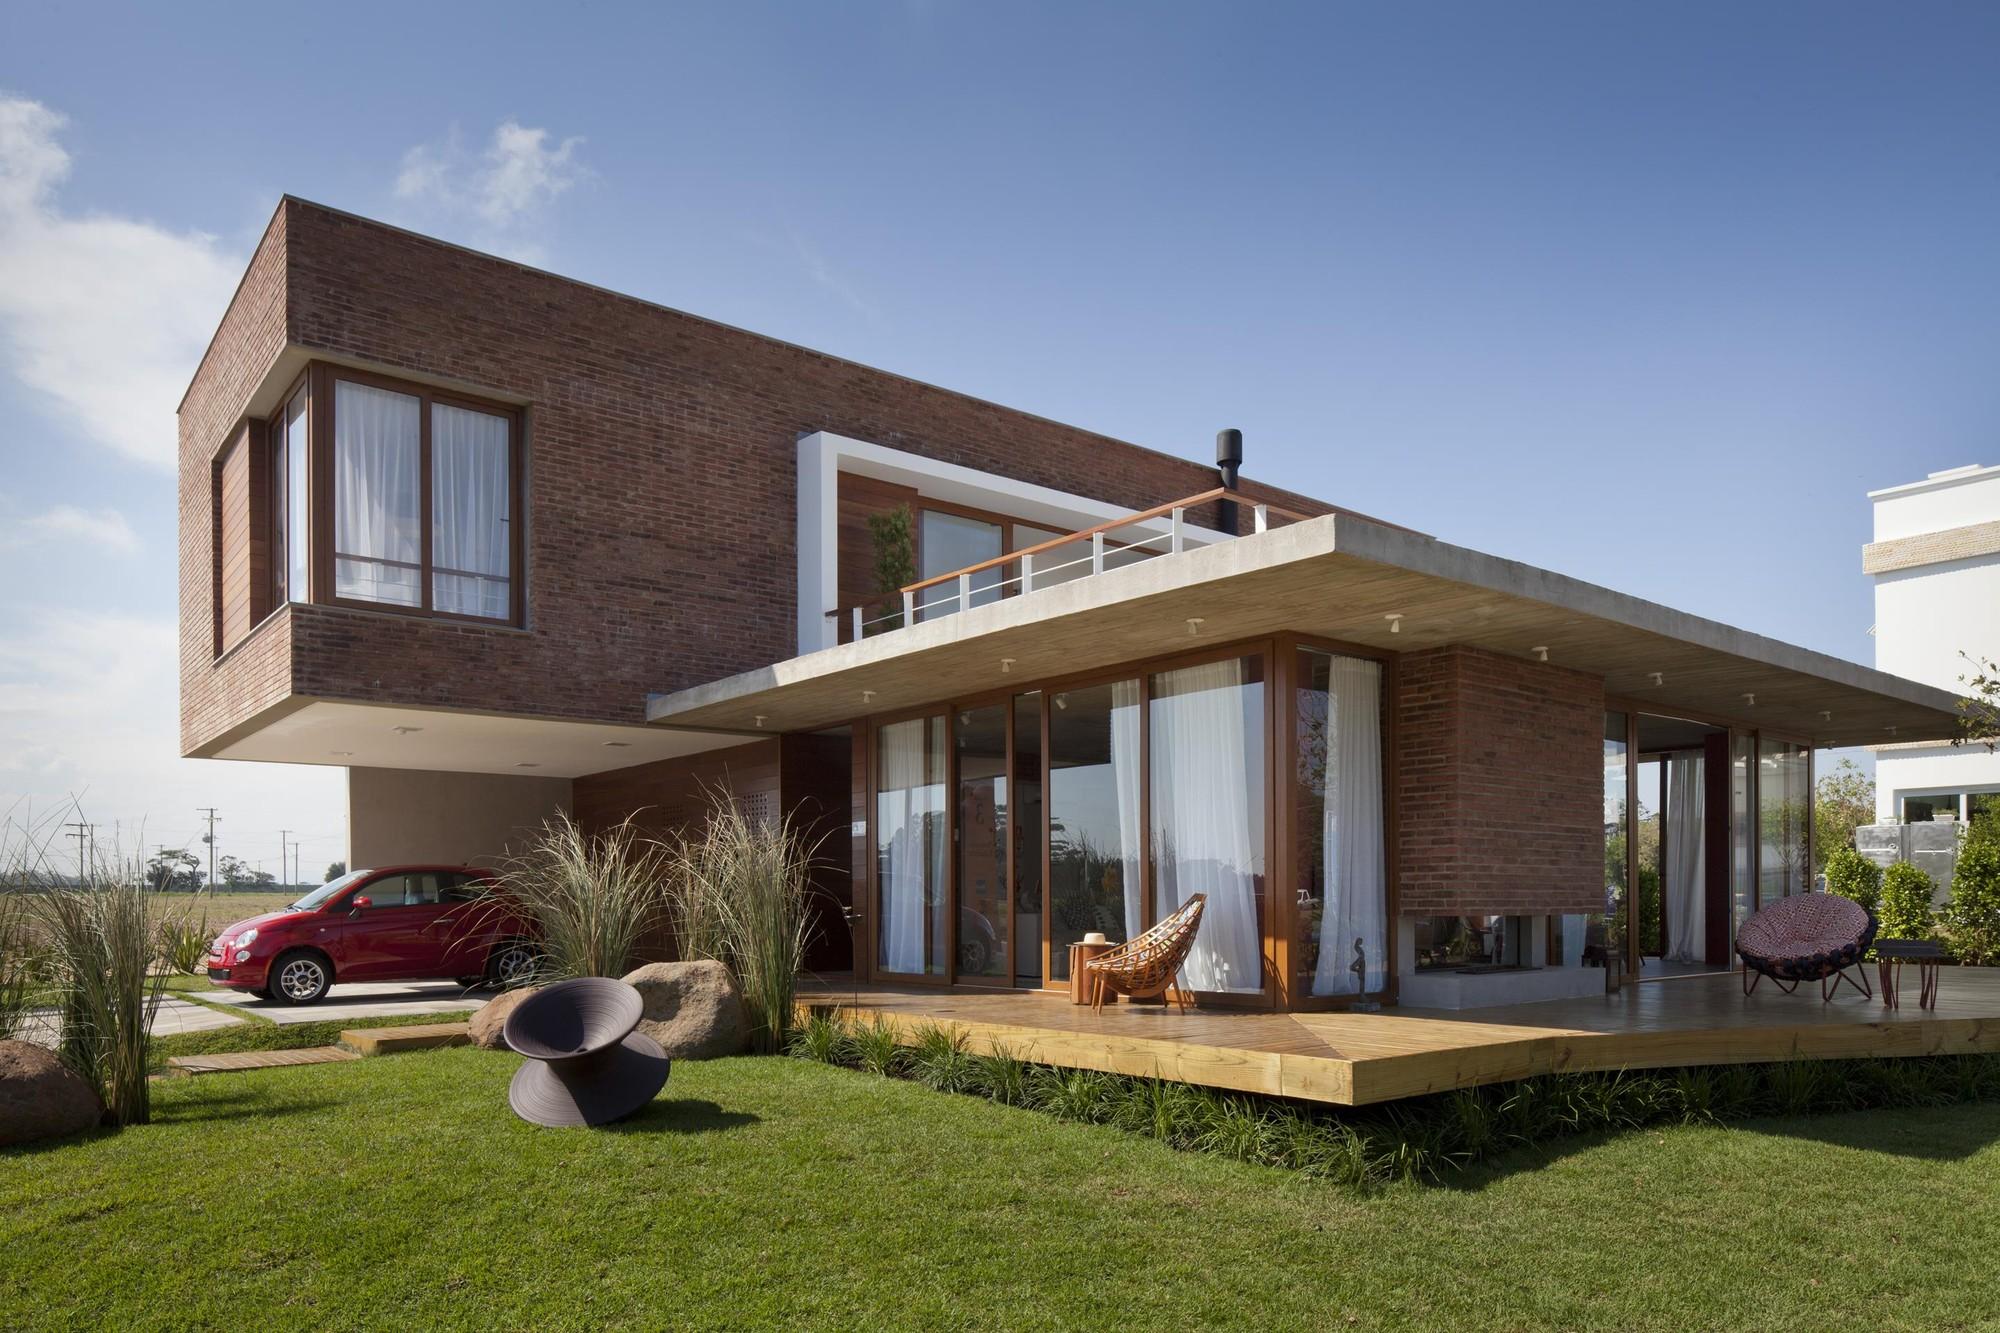 De Casas Con Maritimos. Amazing Affordable Casas Con Martimos Foto ...